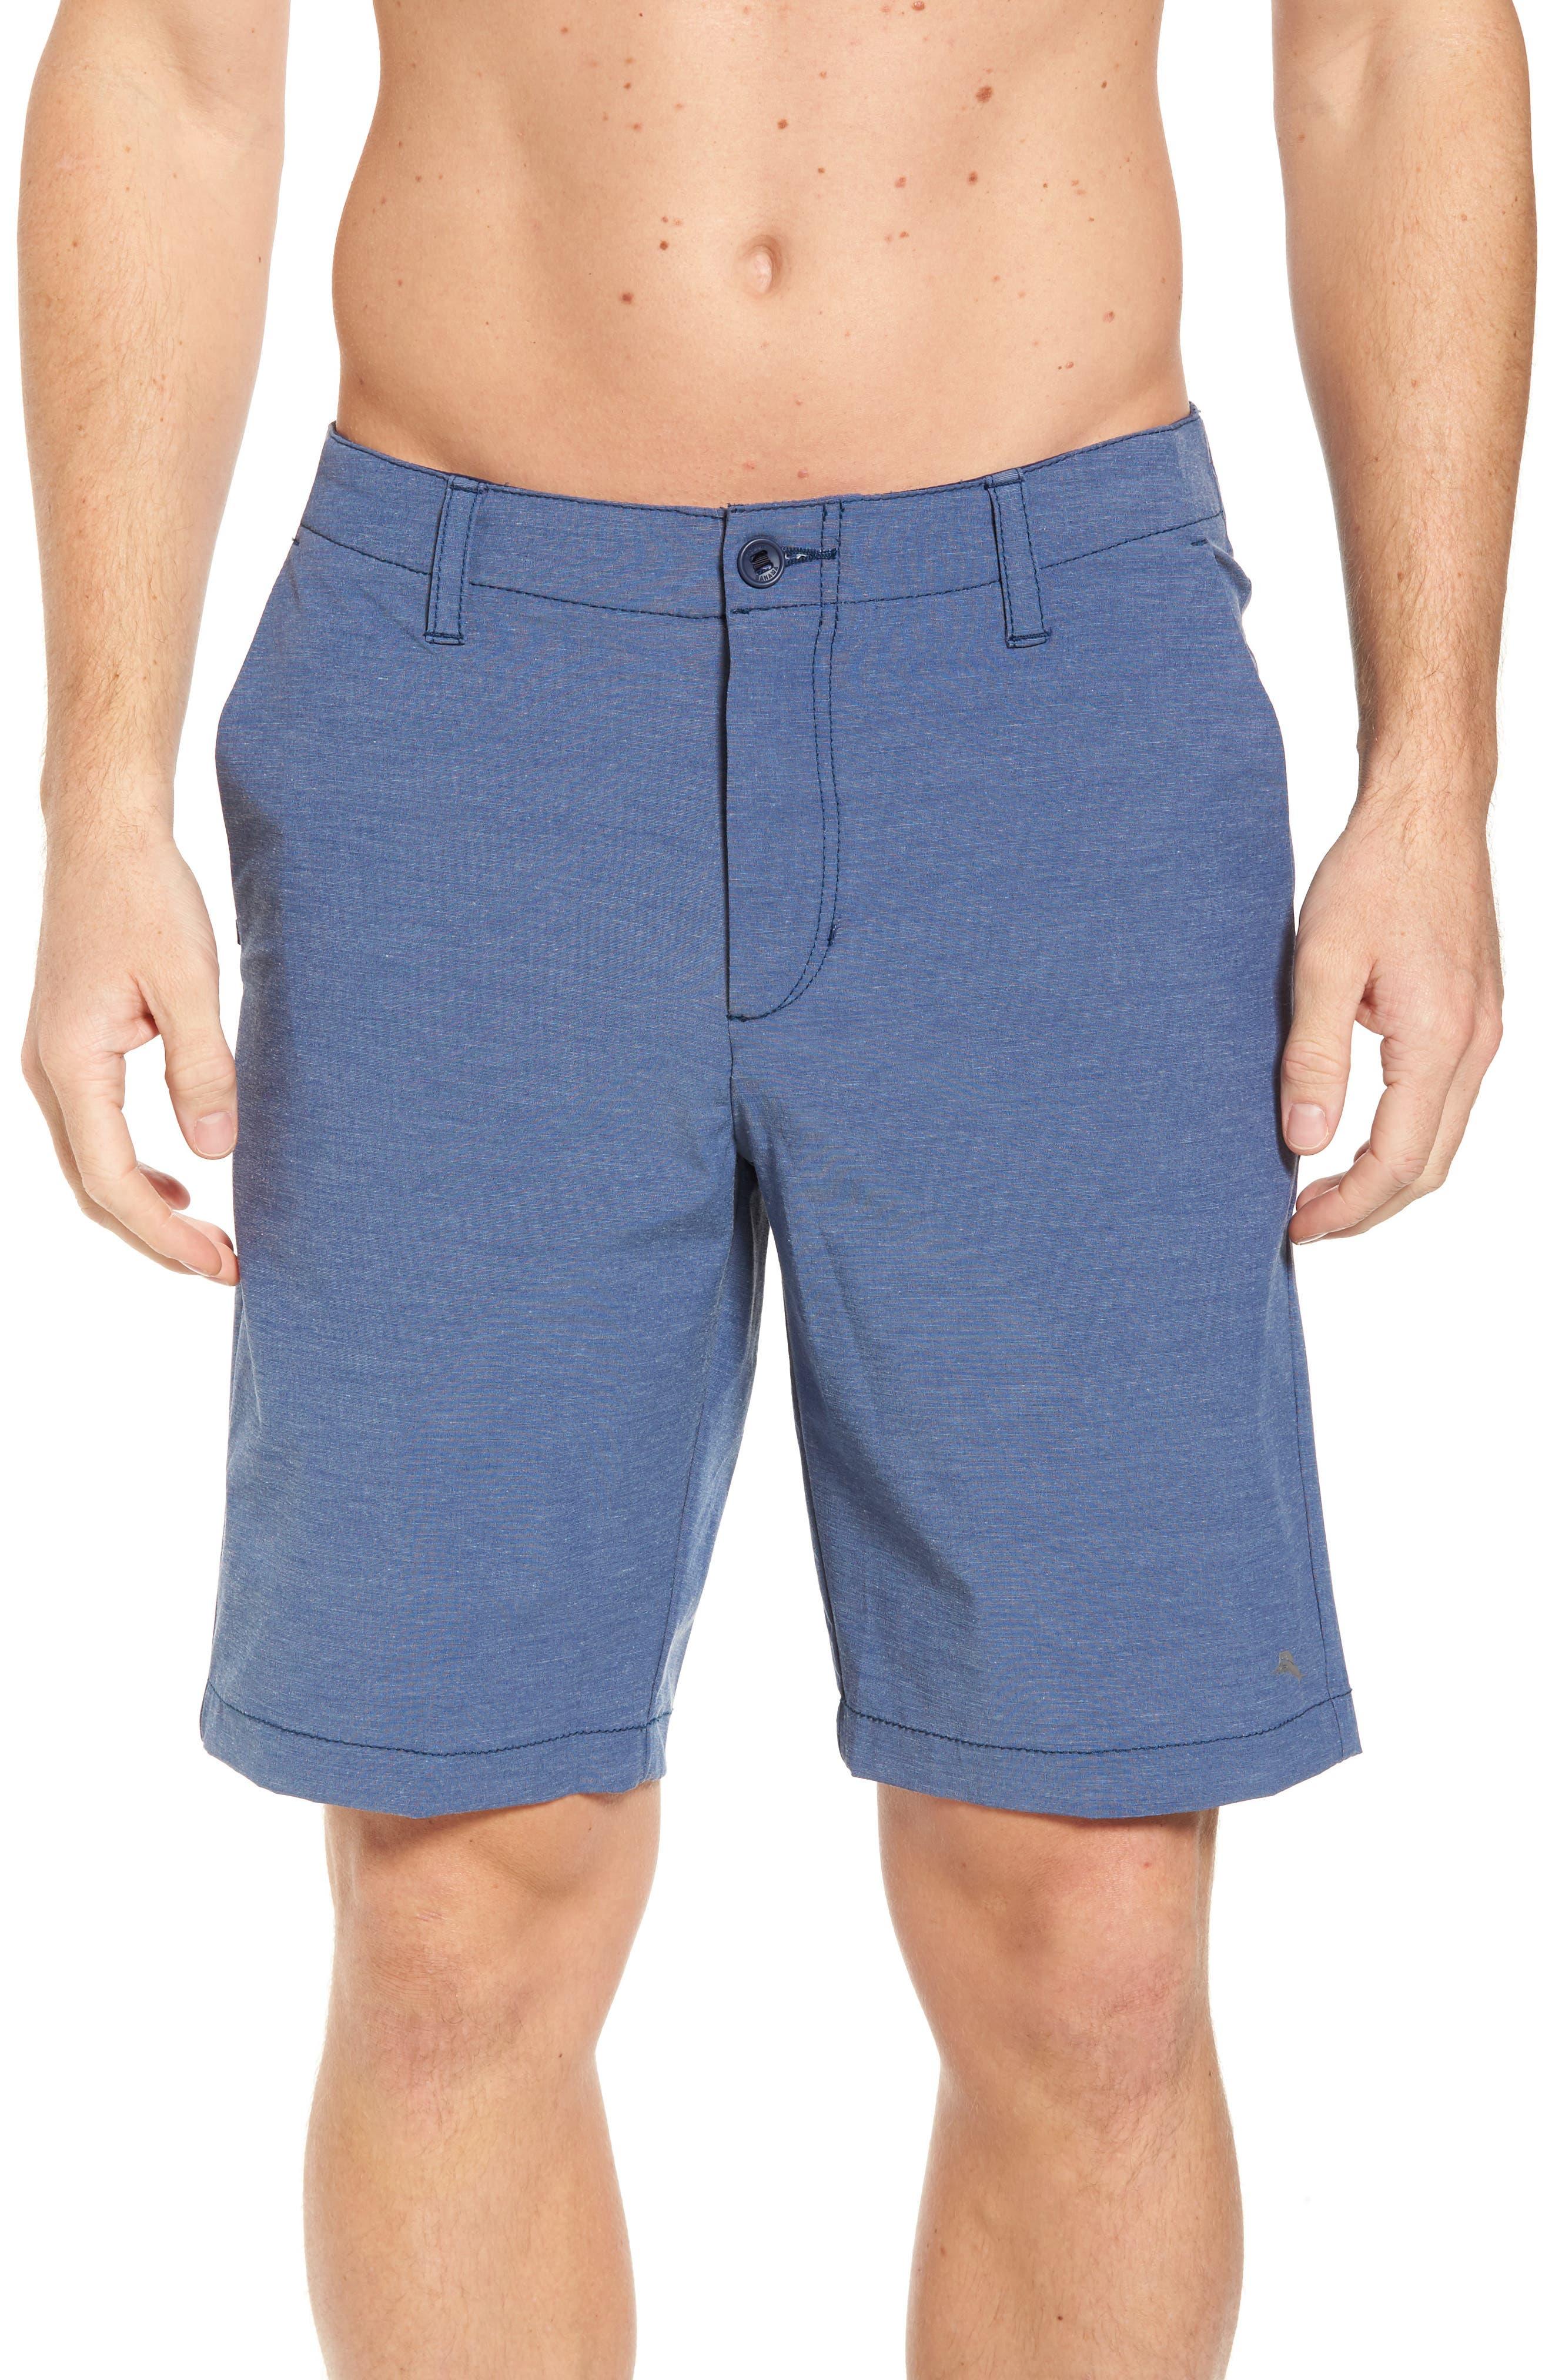 Chip & Run Shorts,                         Main,                         color, Dockside Blue